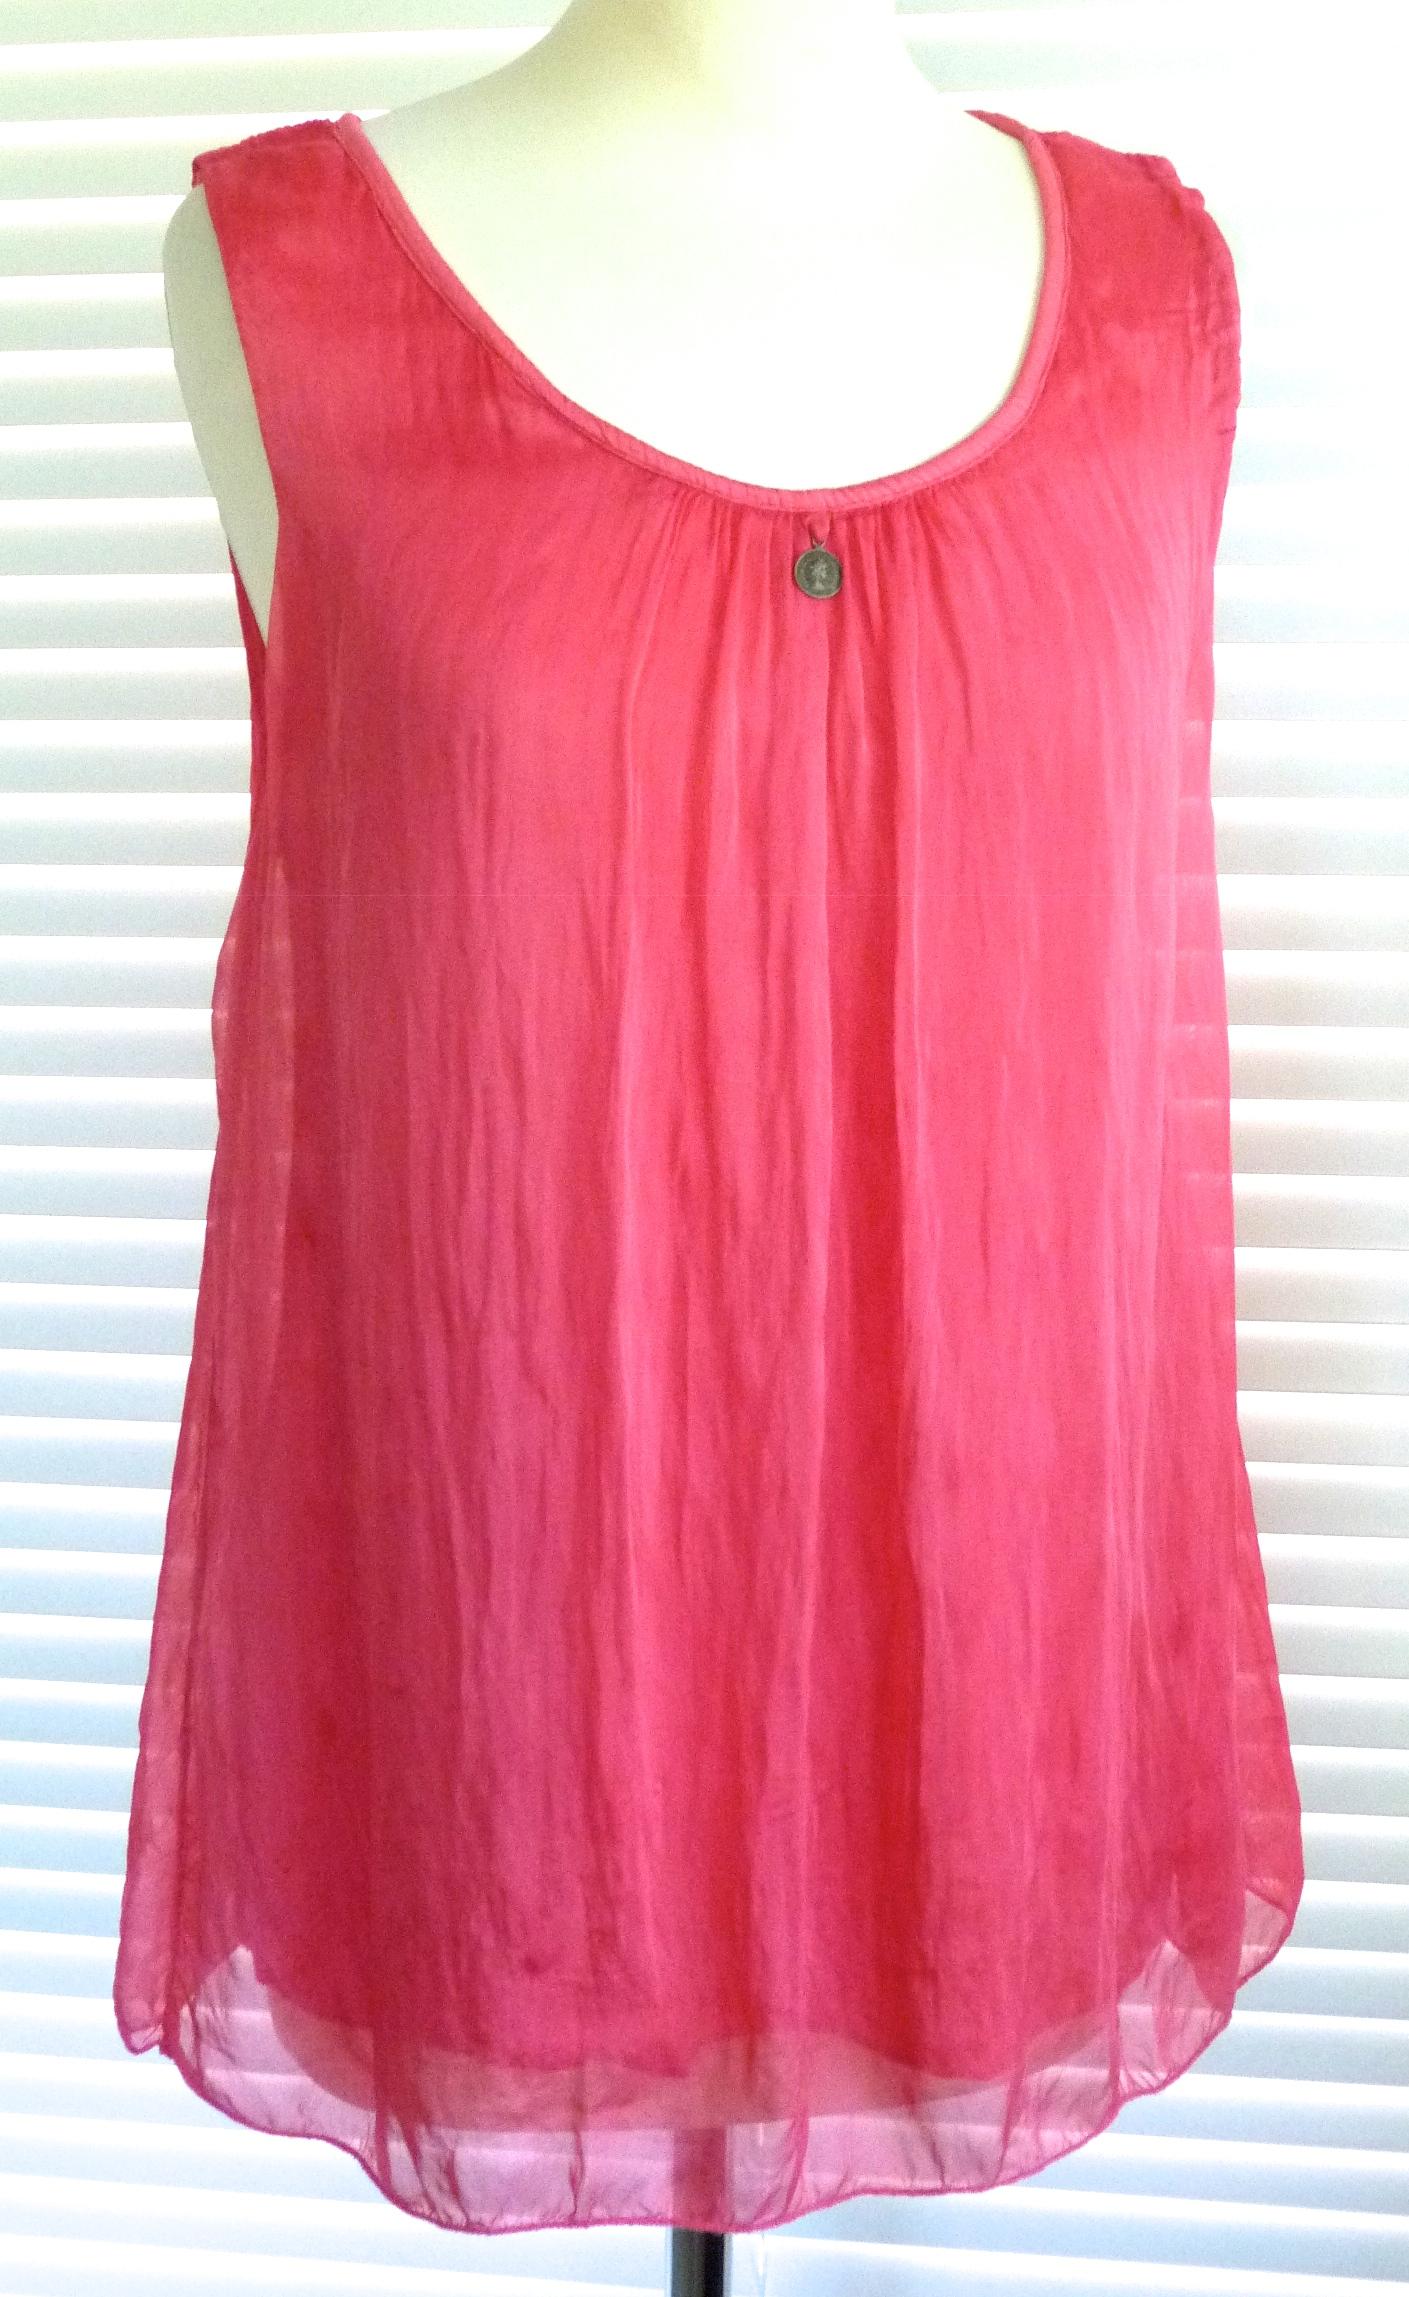 Outlet New Jersey >> Beautiful sleeveless Italian silk floaty top - Sienna ...